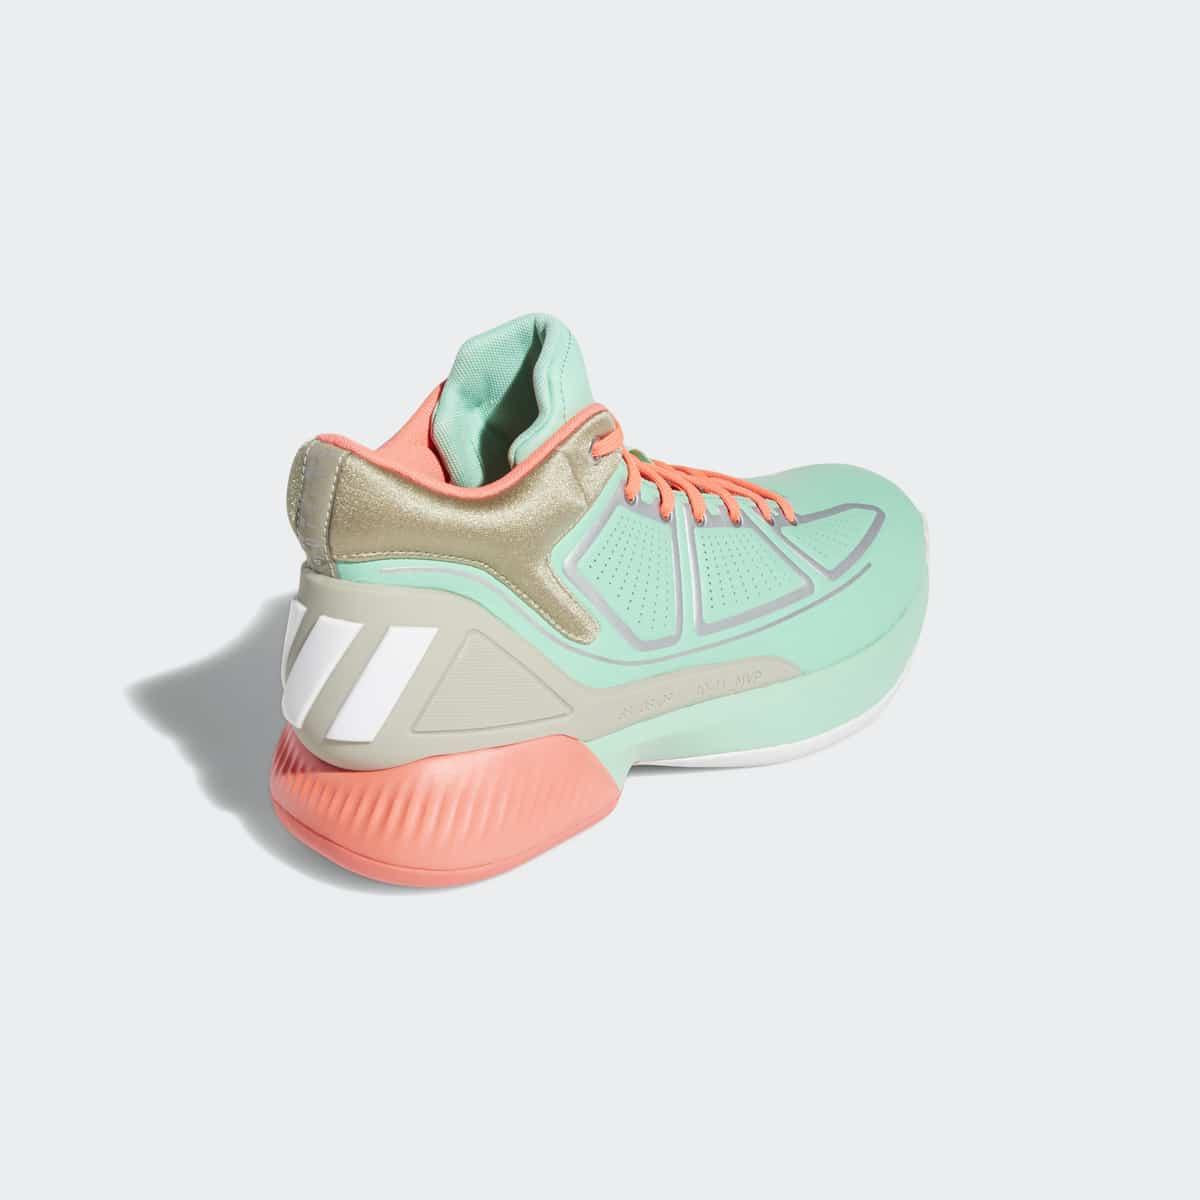 adidas d rose boardwalk